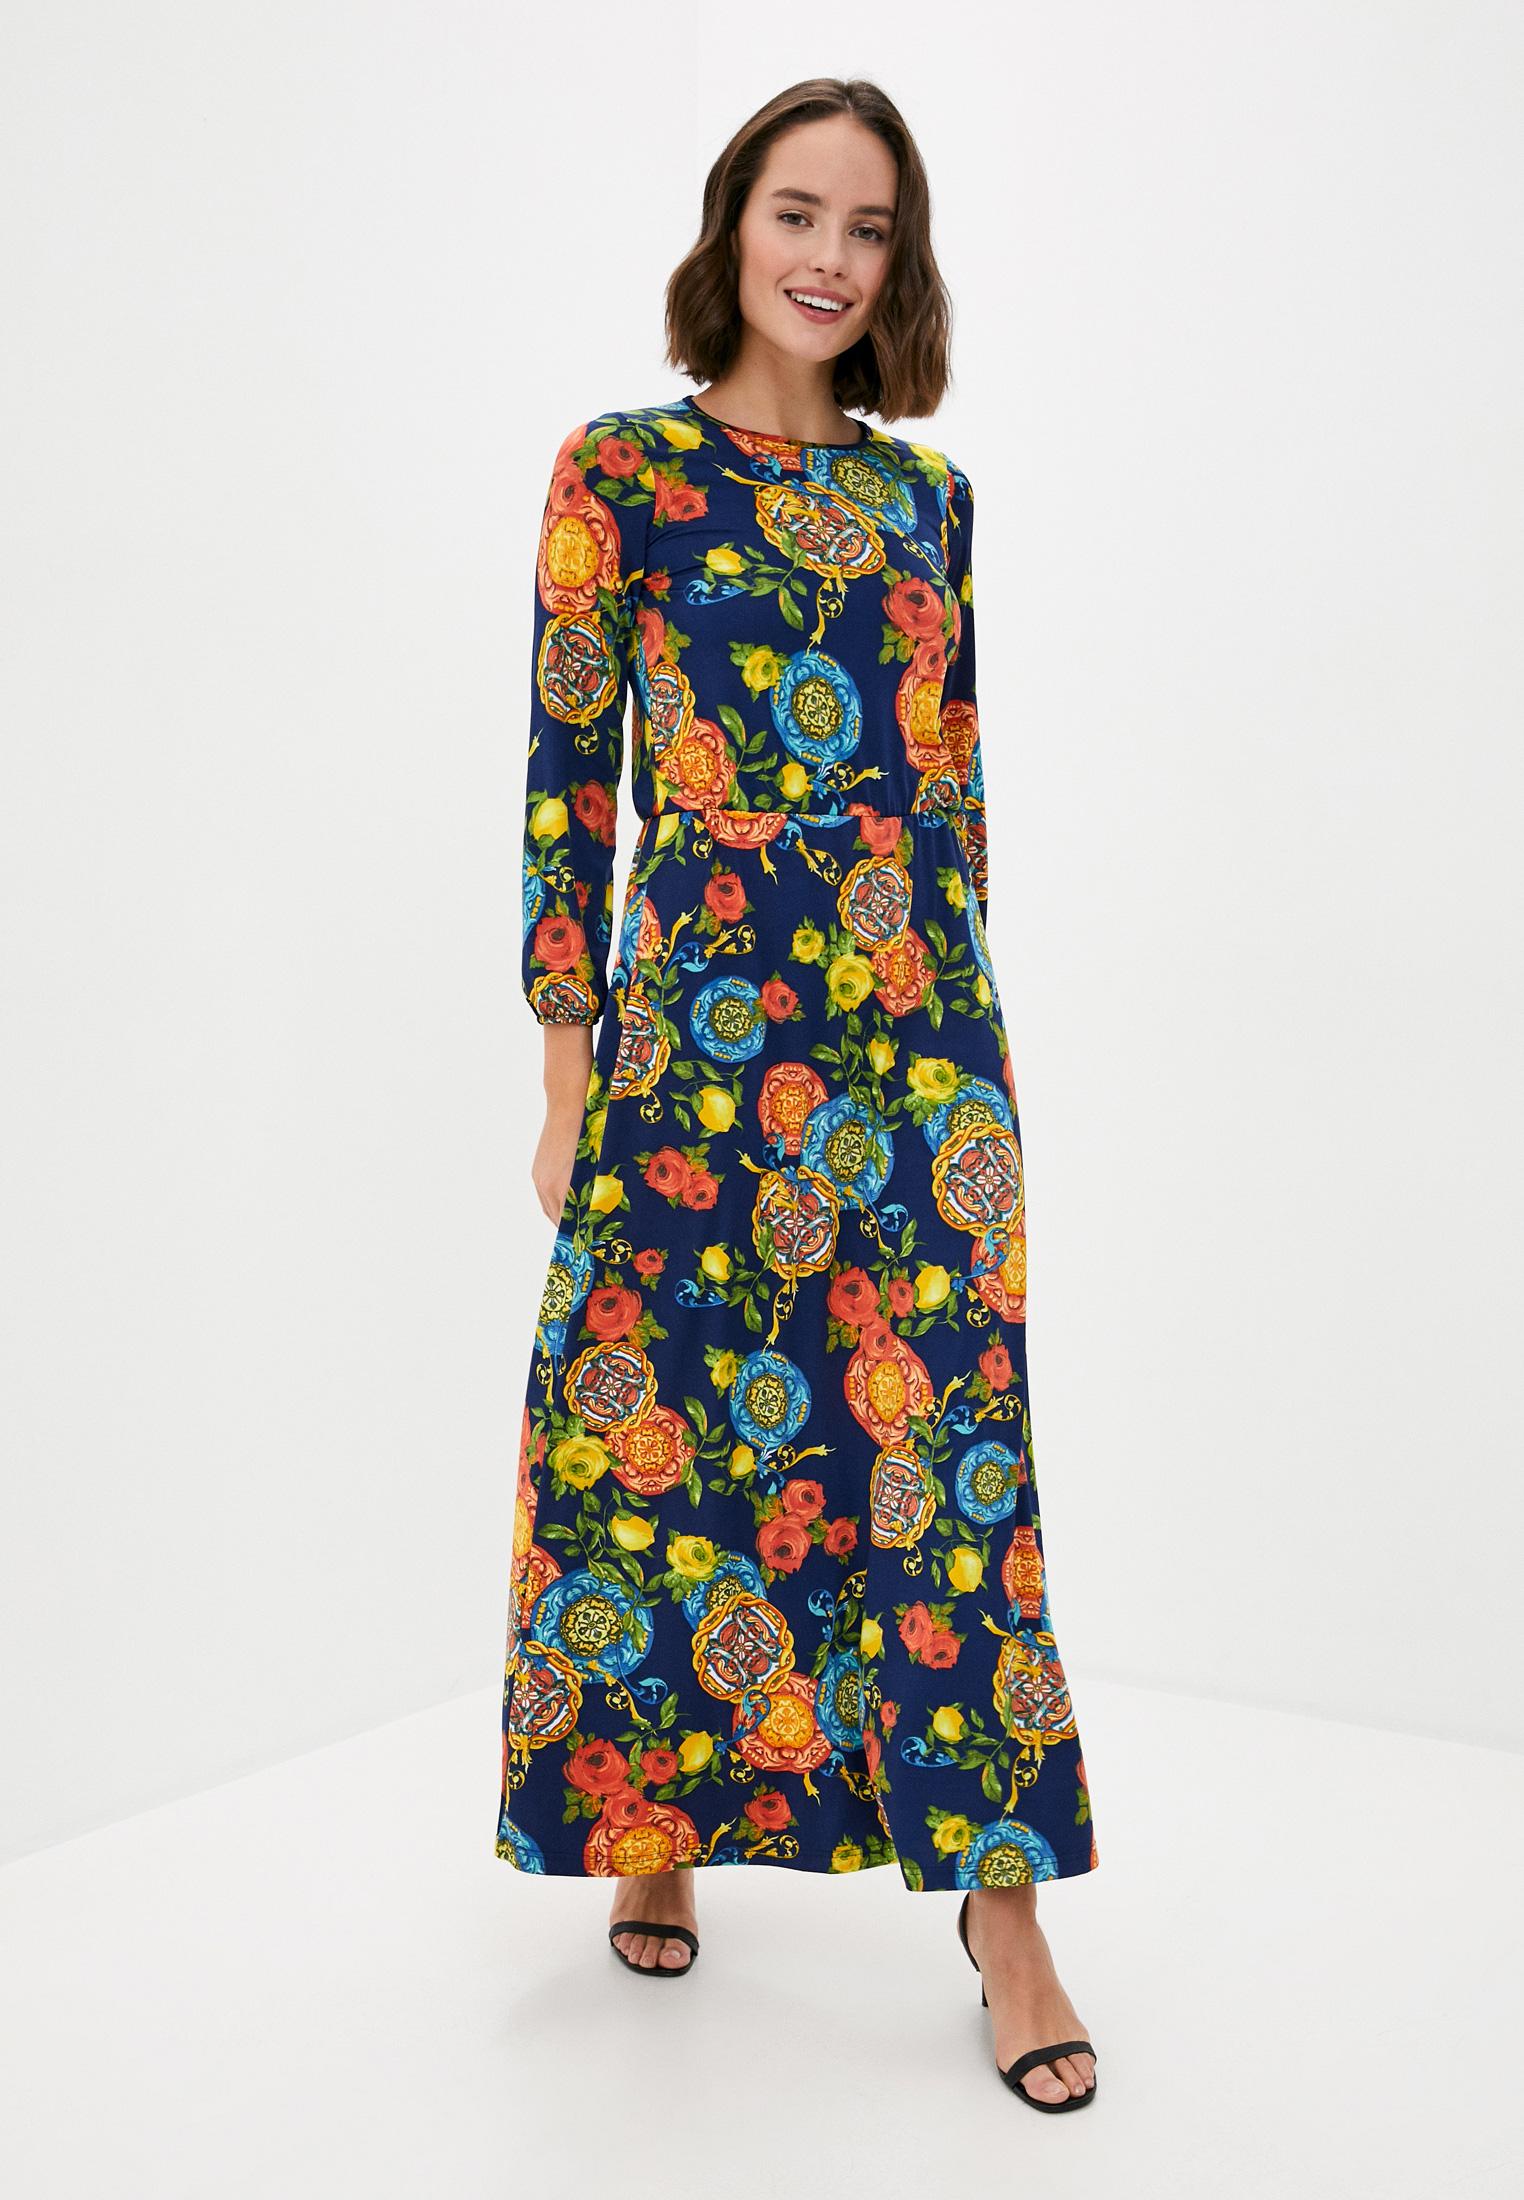 Платье A-A Awesome Apparel by Ksenia Avakyan купить за 1 135 ₽ в интернет-магазине Lamoda.ru